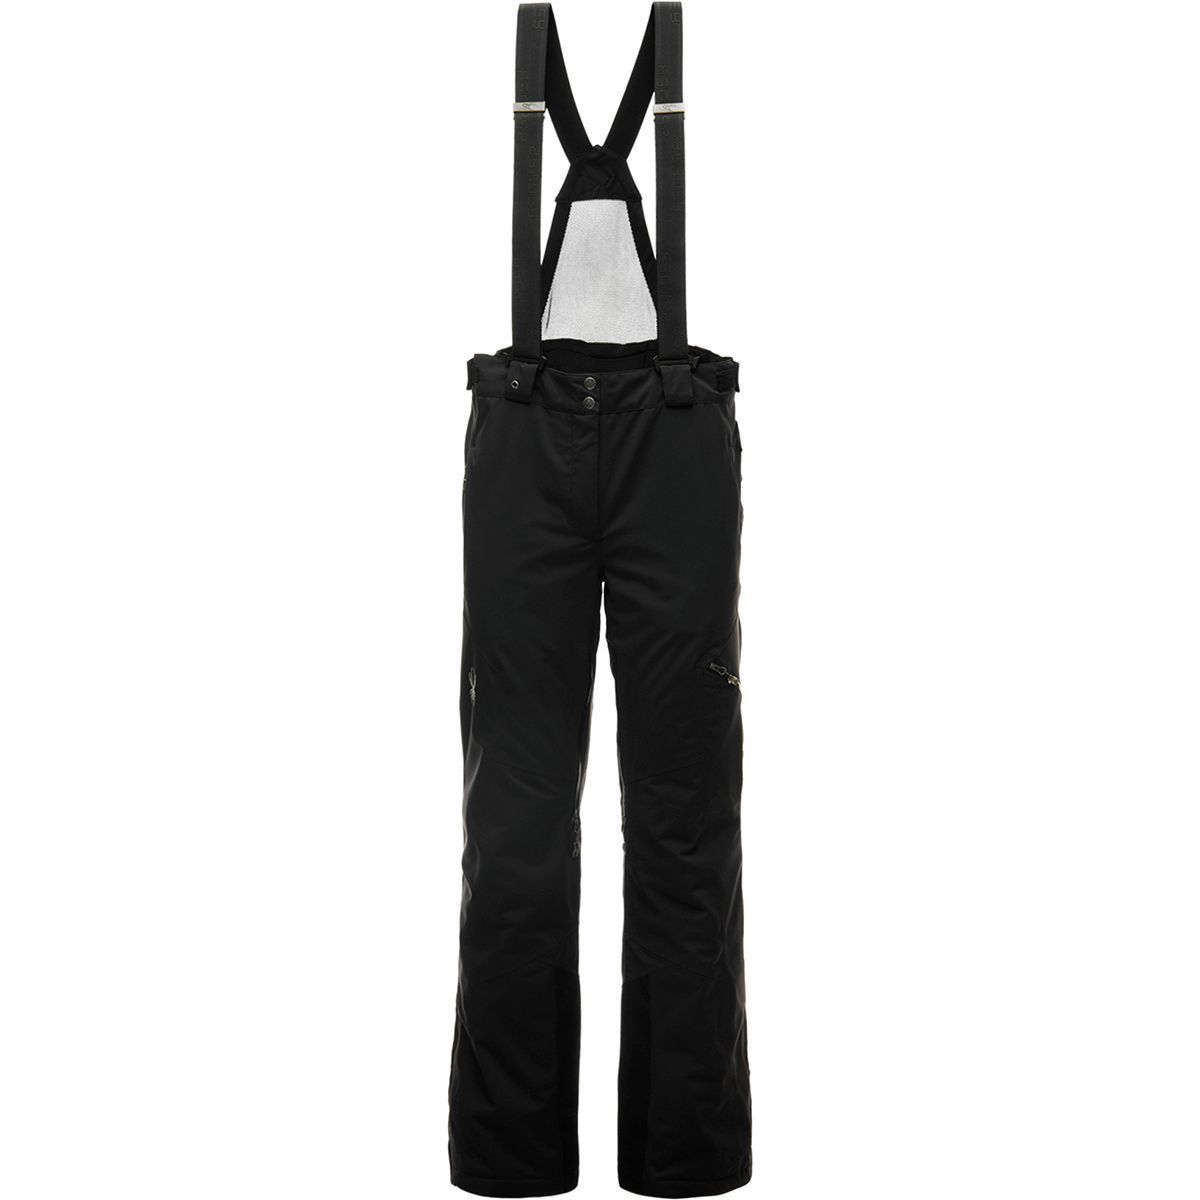 Spyder Dare Tailored Gore-Tex Pant - Men's